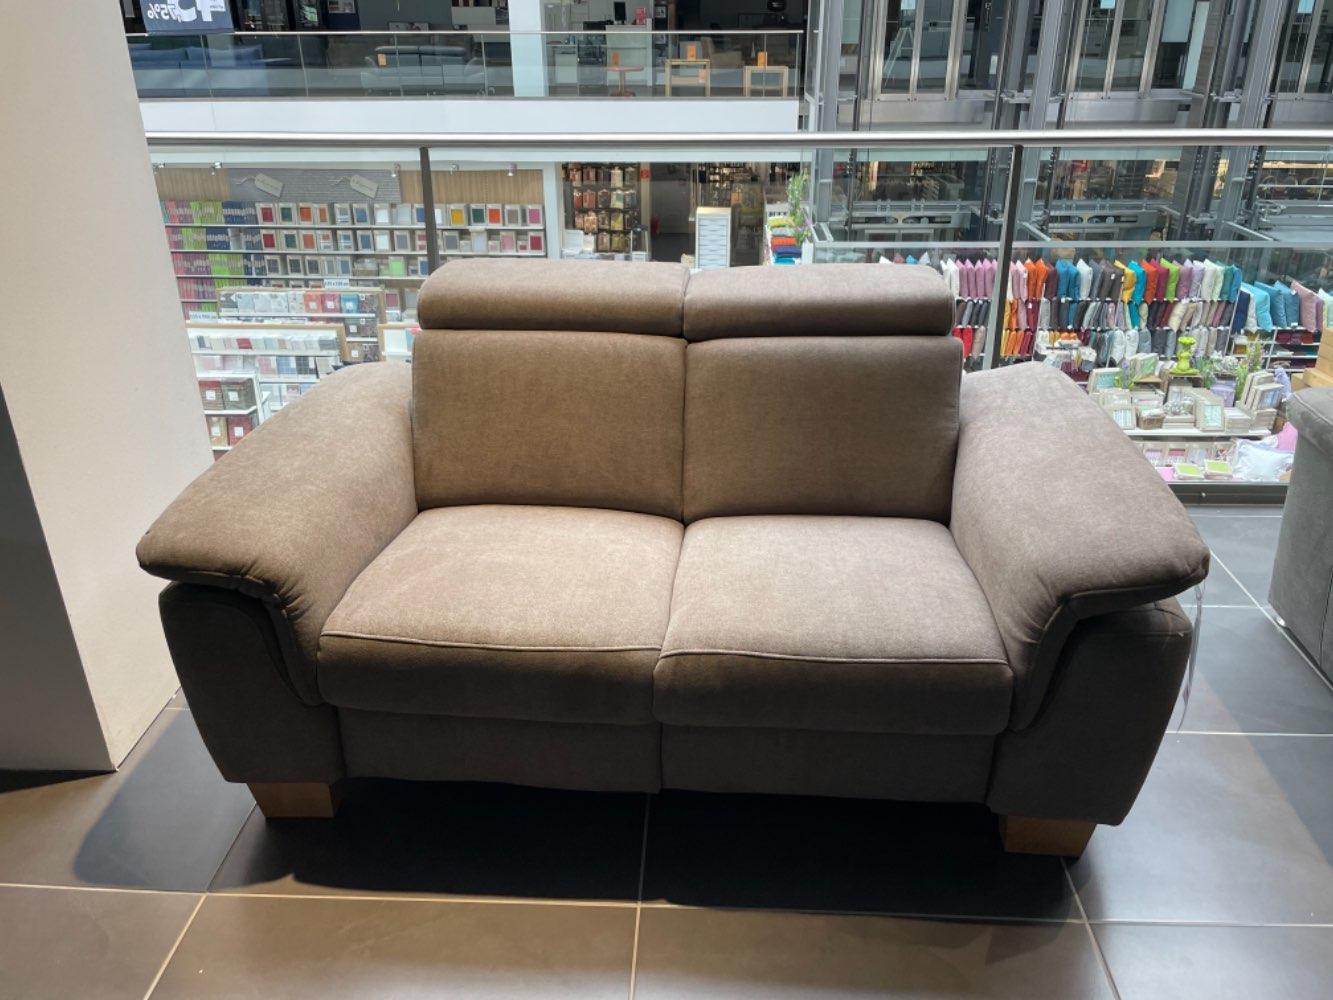 Möbel, Zweisitzer, B/H/T 166x80x90 cm, Hellbraun, XXXL